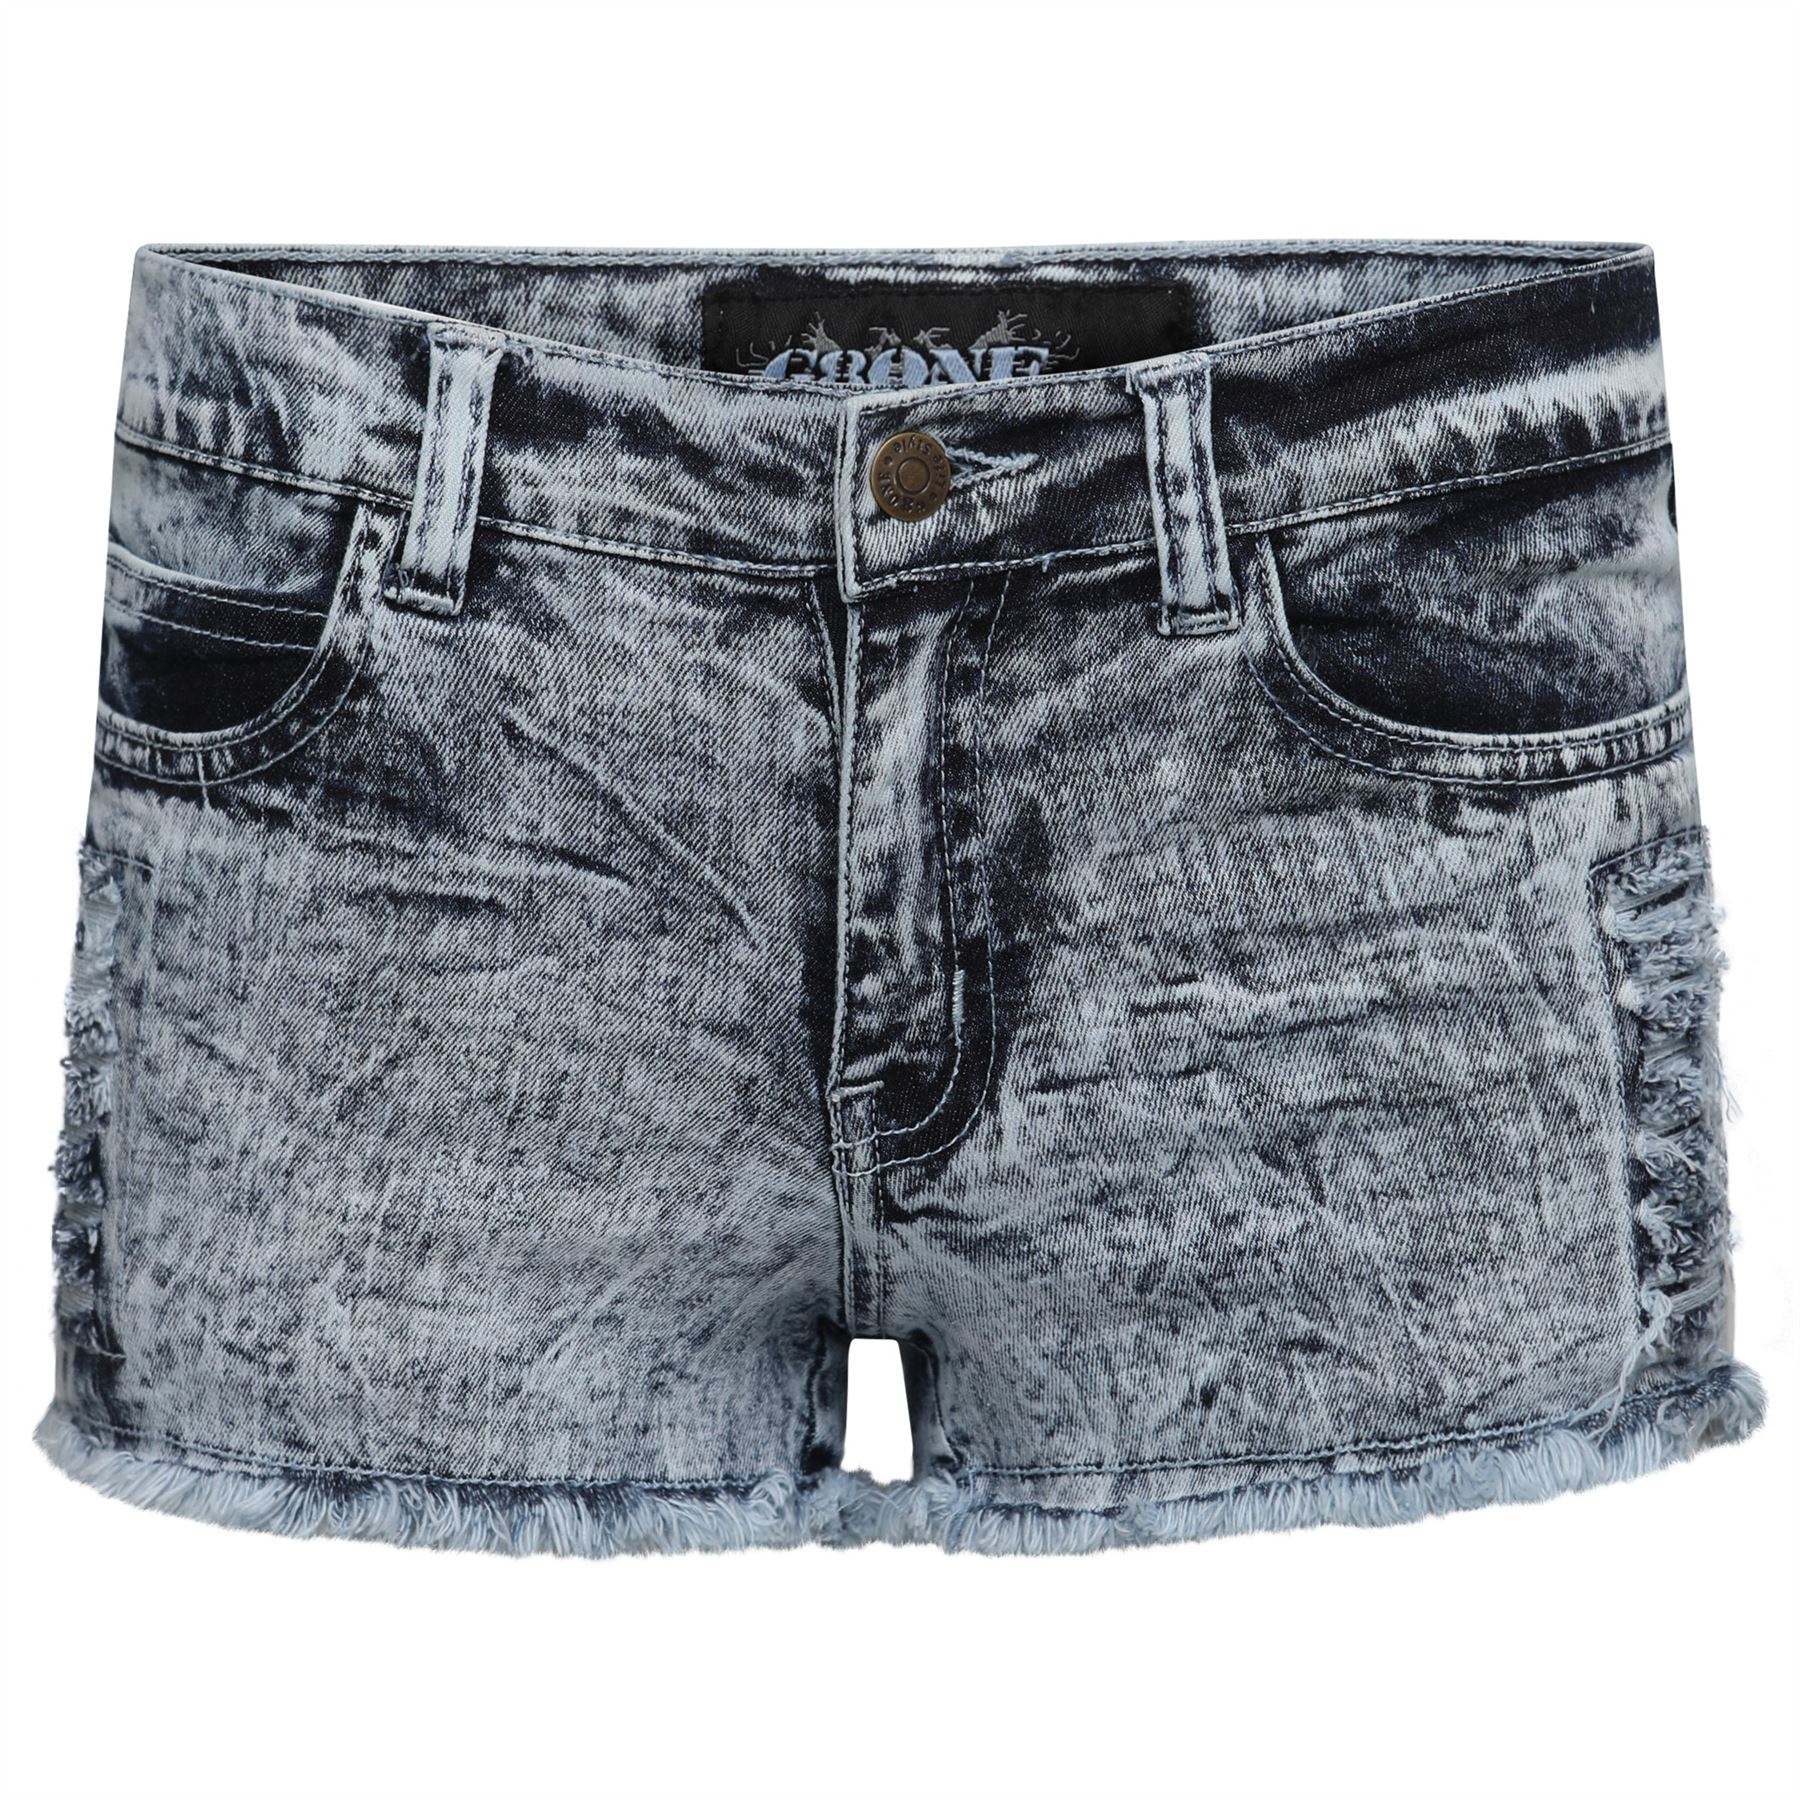 640bd38071 Ladies Denim Shorts Women Bottoms Frayed Hem Ripped Stretch Size UK 8-16